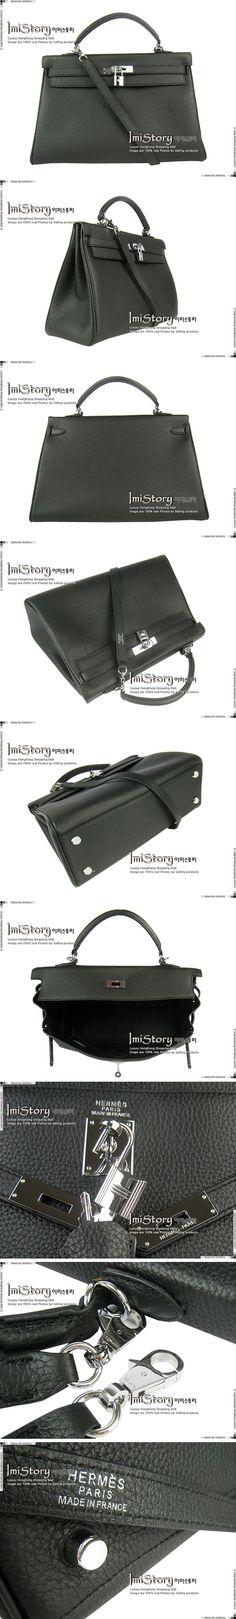 Hermes Swift Rose Sakura Kelly Bag 25cm with Gold Hardware ...